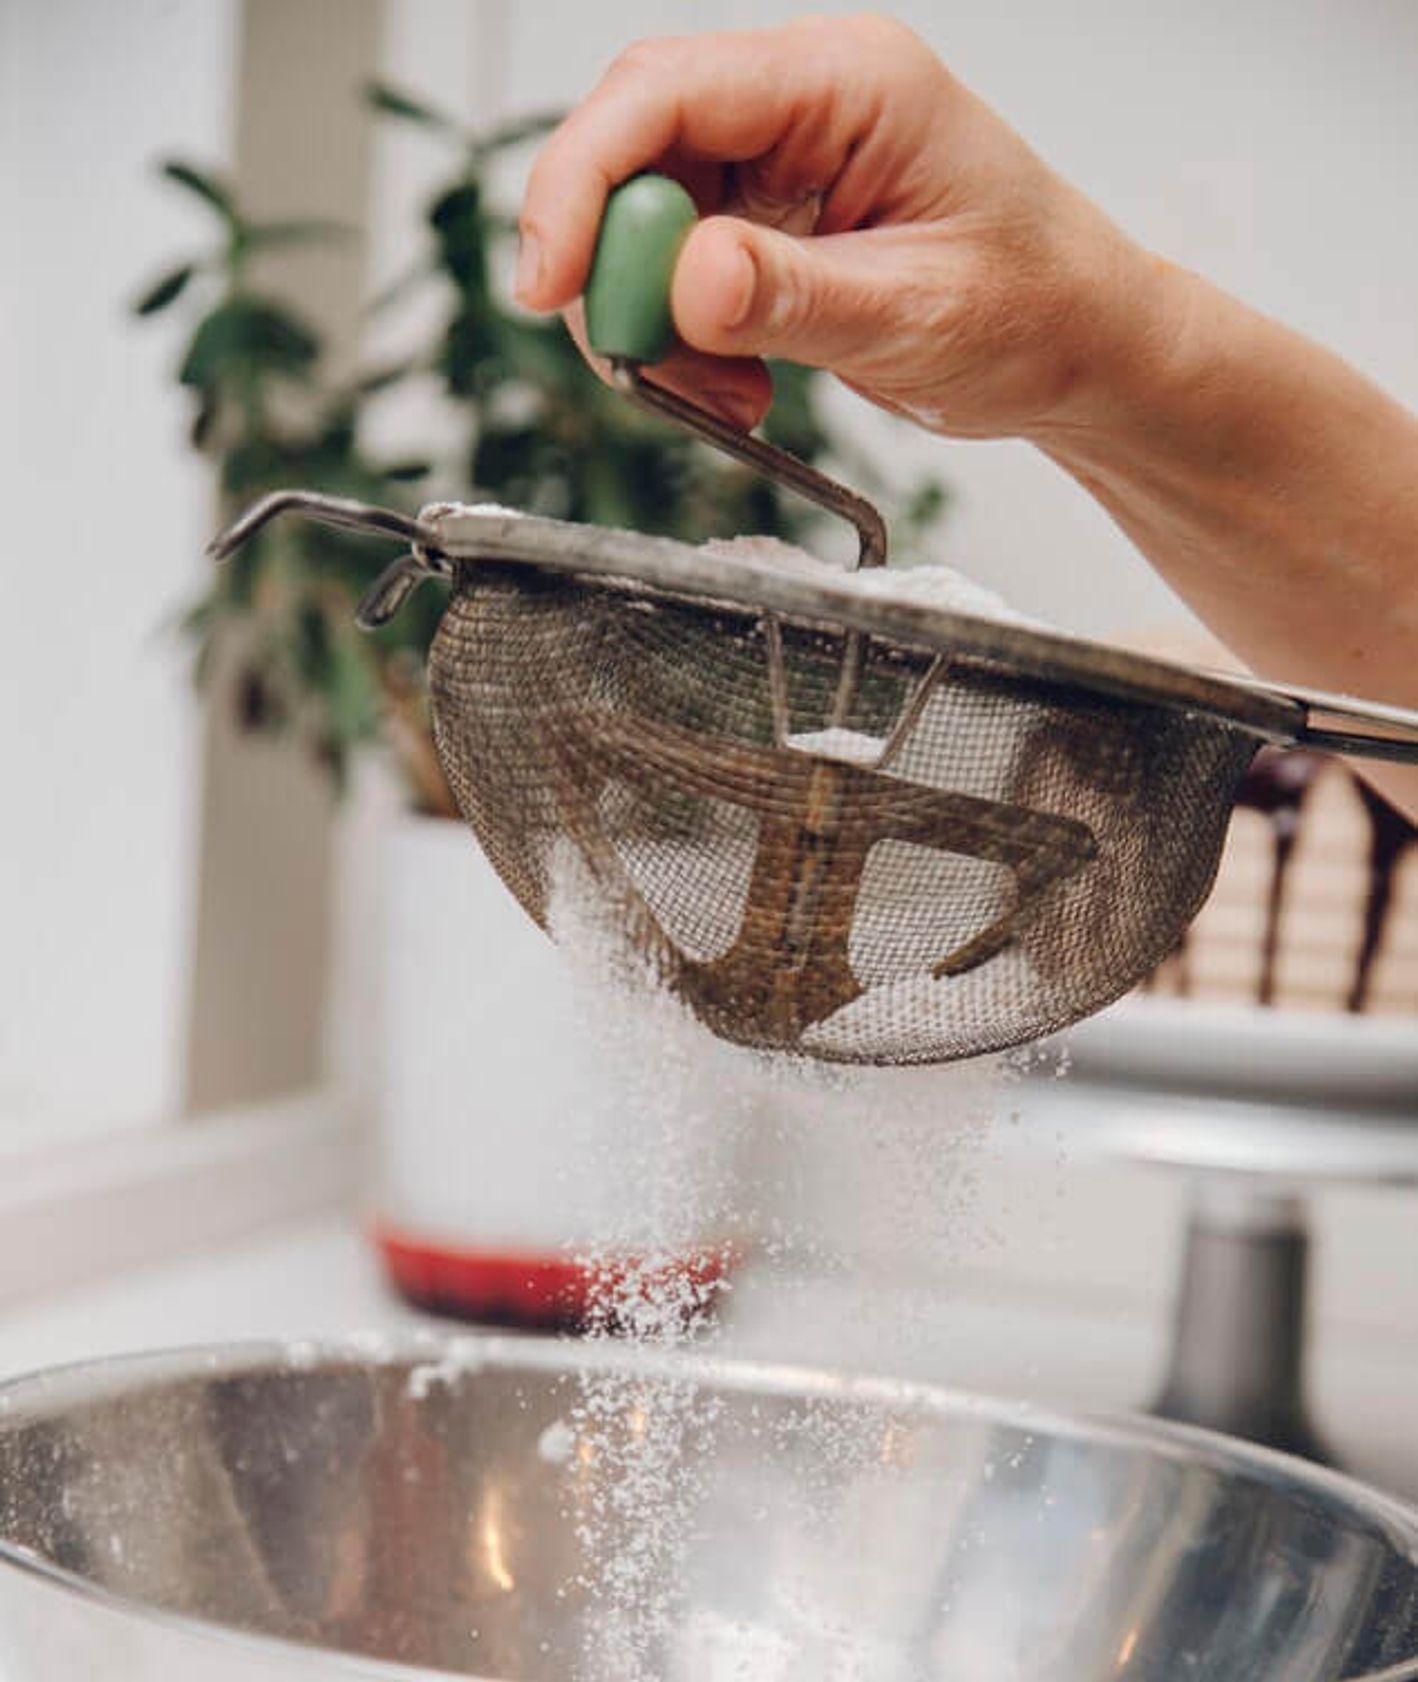 mąki bezglutenowe, mąka bez glutenu, rodzaje mąk, mąka, kukbuk mąka bezglutenowa, jak wybrać mąkę bez glutenu